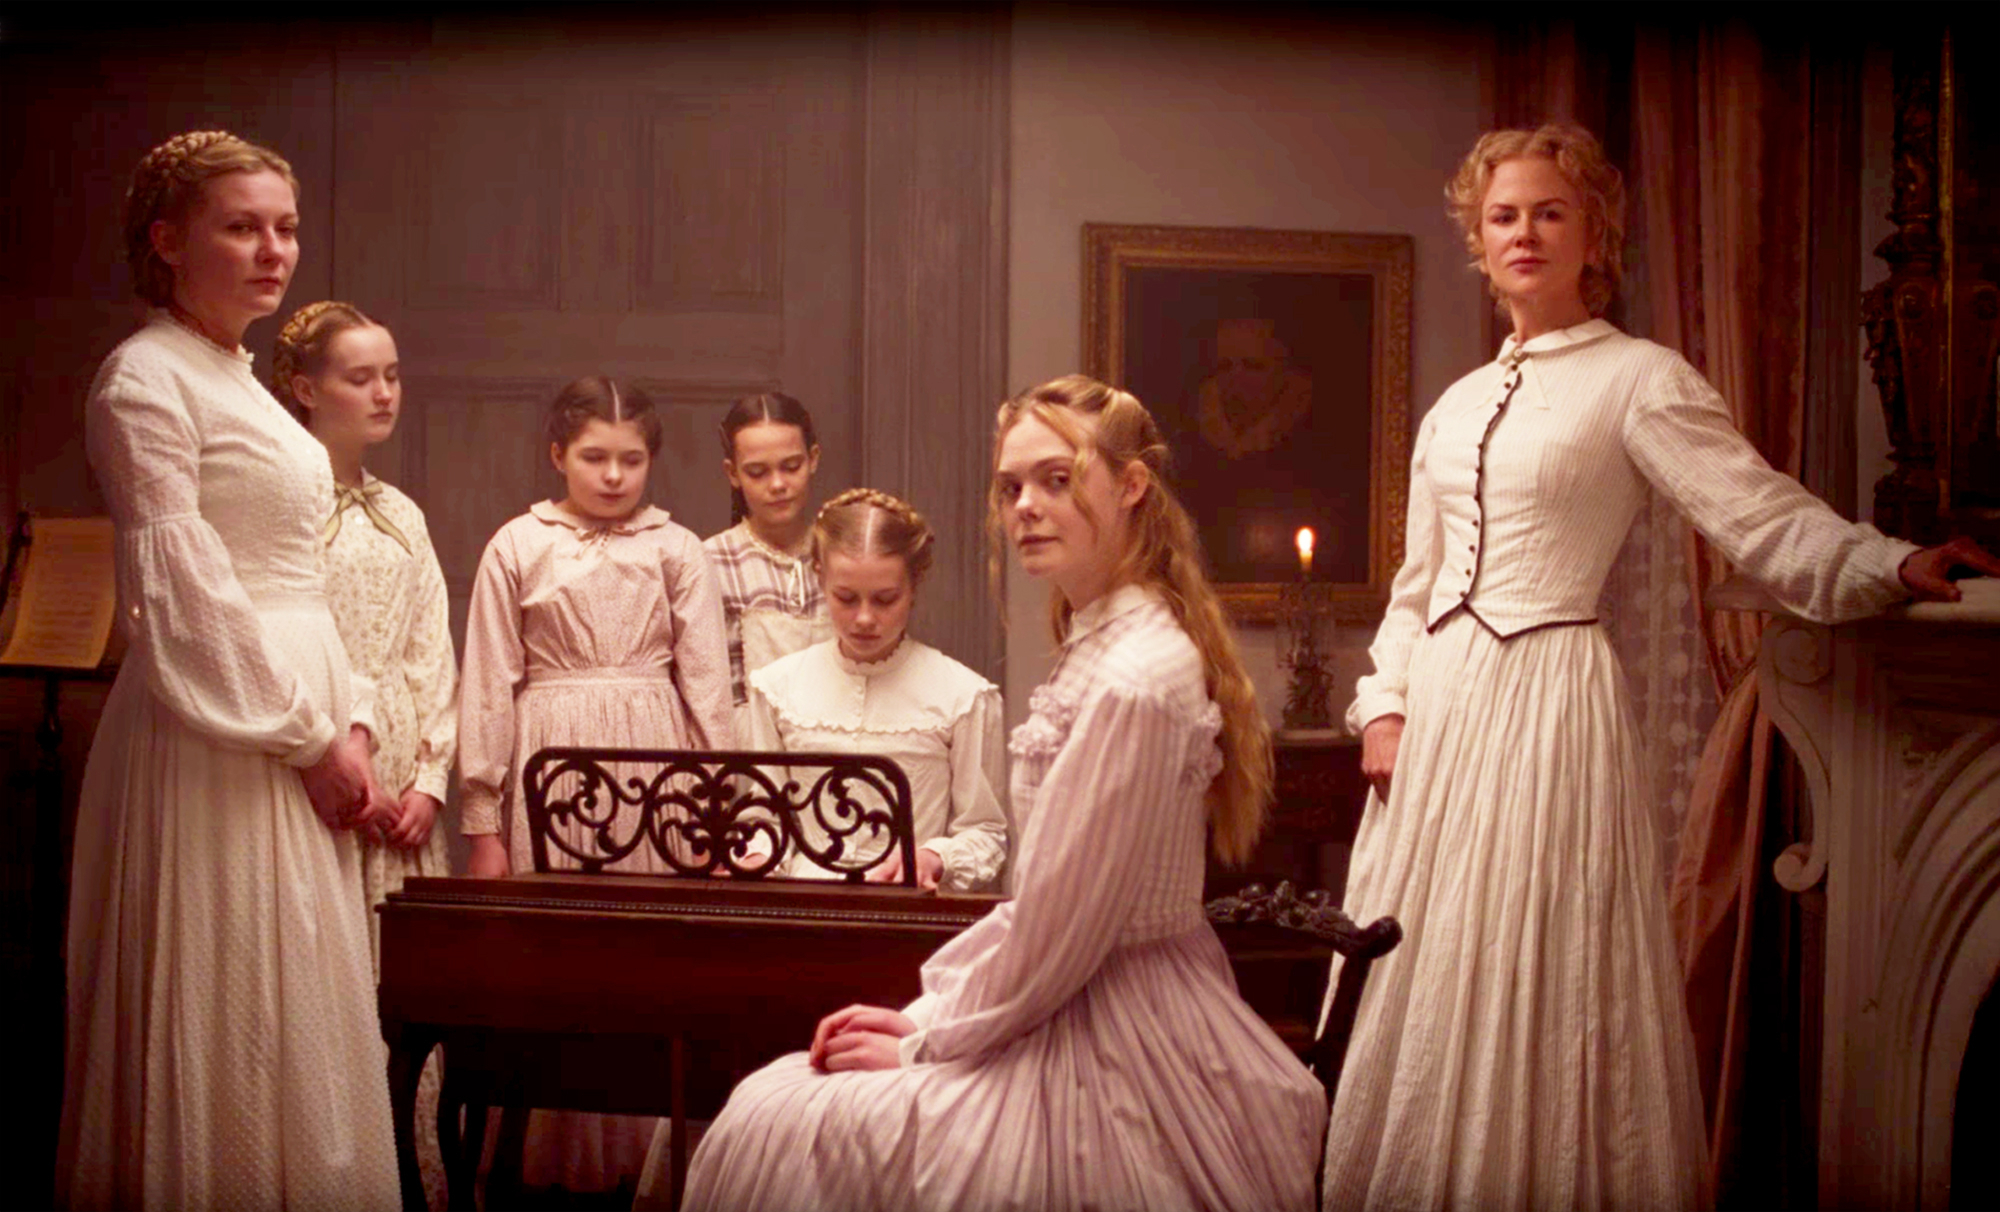 Nicole Kidman, Kirsten Dunst and Elle Fanning